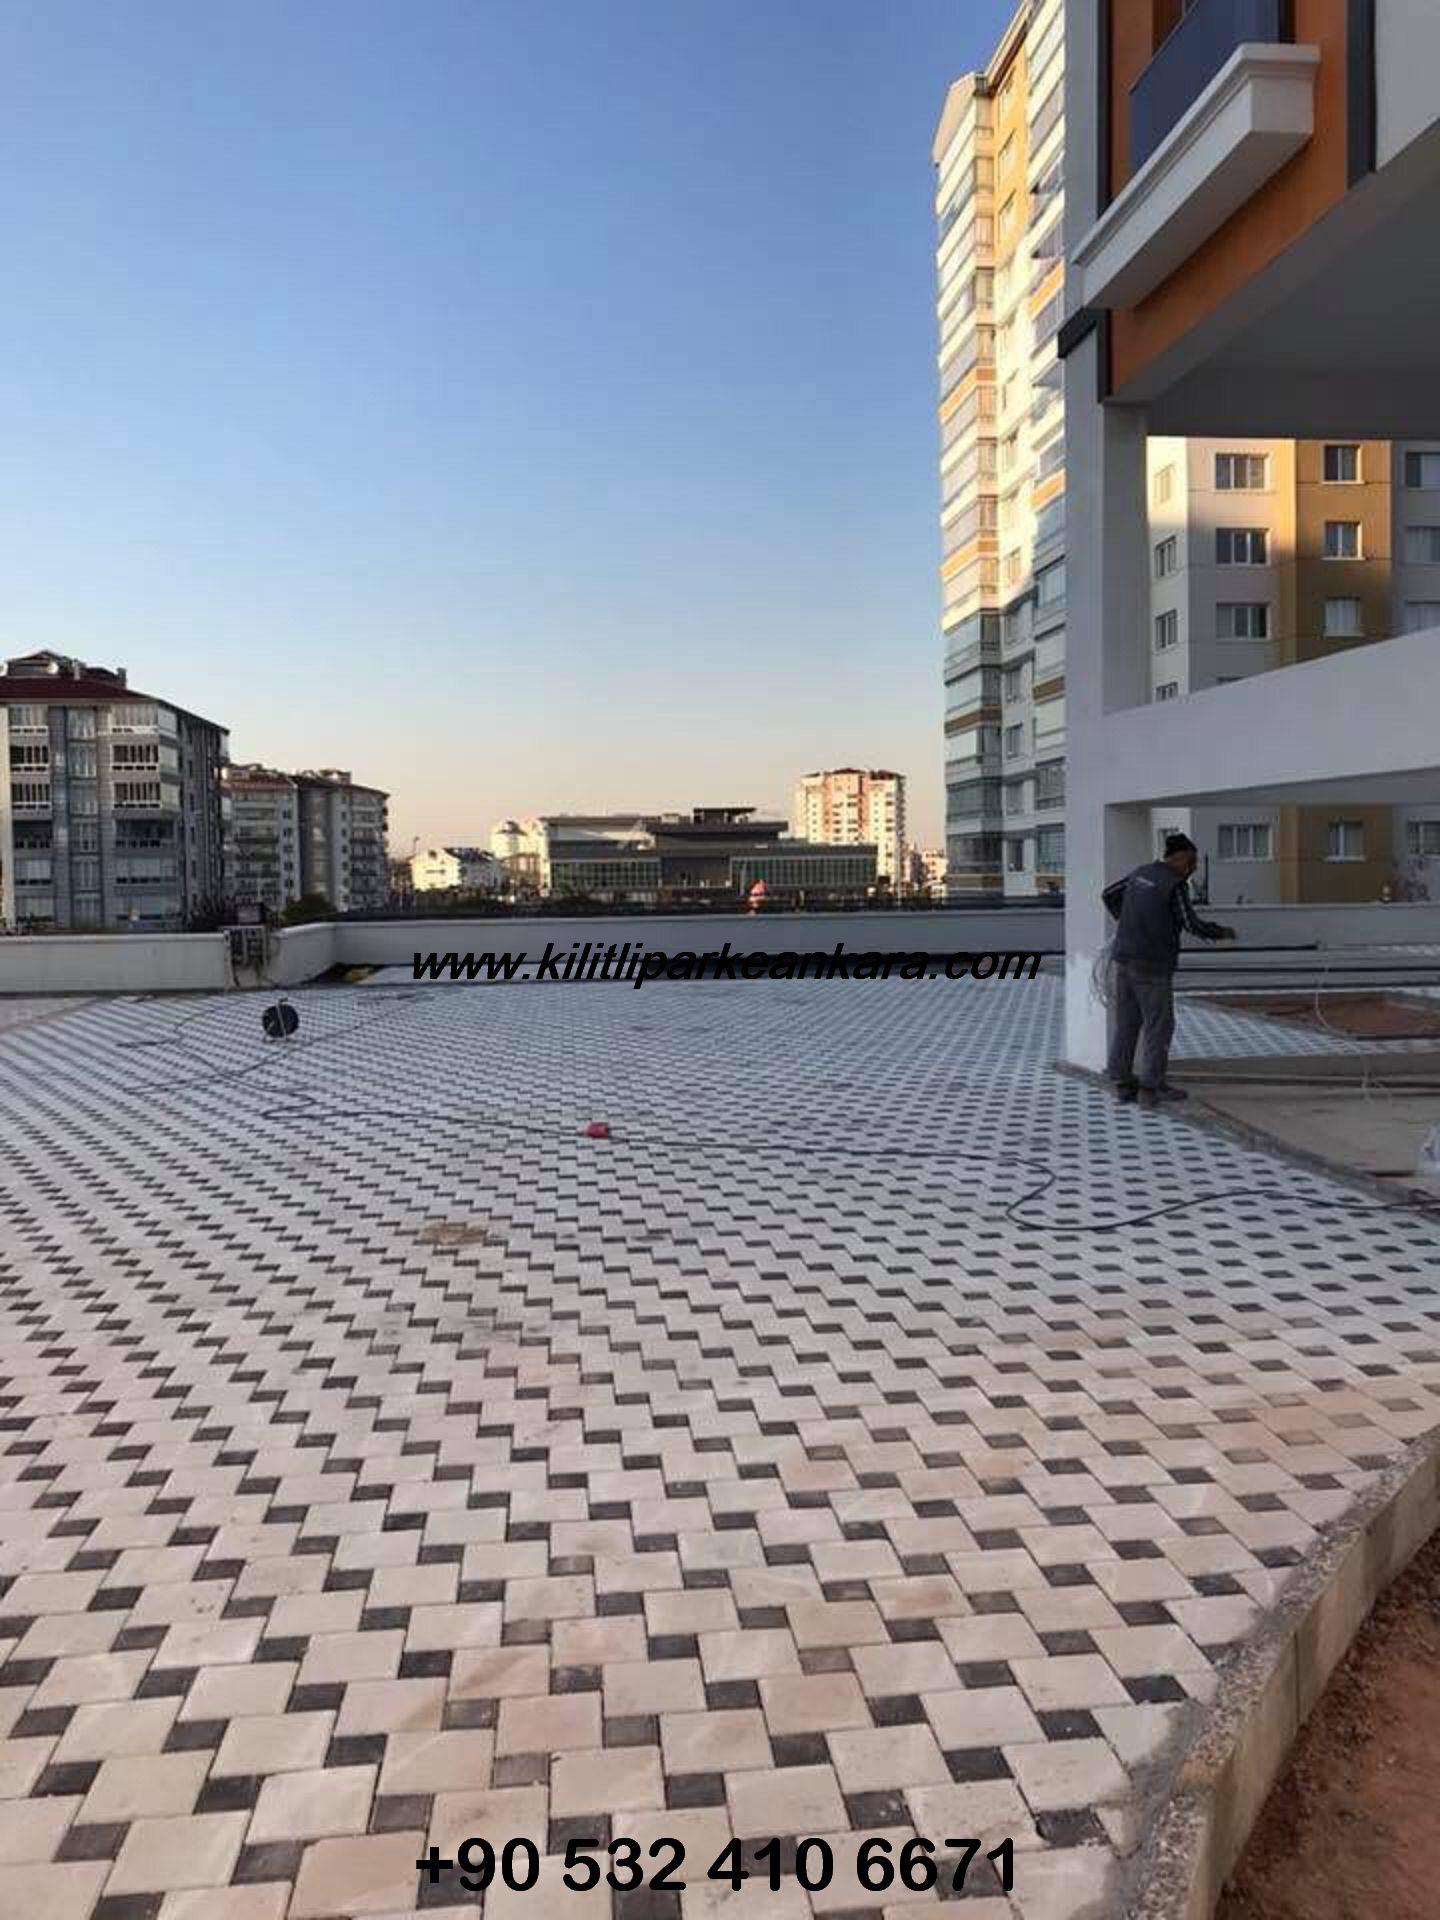 Ankara Kilit Taşı - Kilitli Parke Taşı Ustası (004)